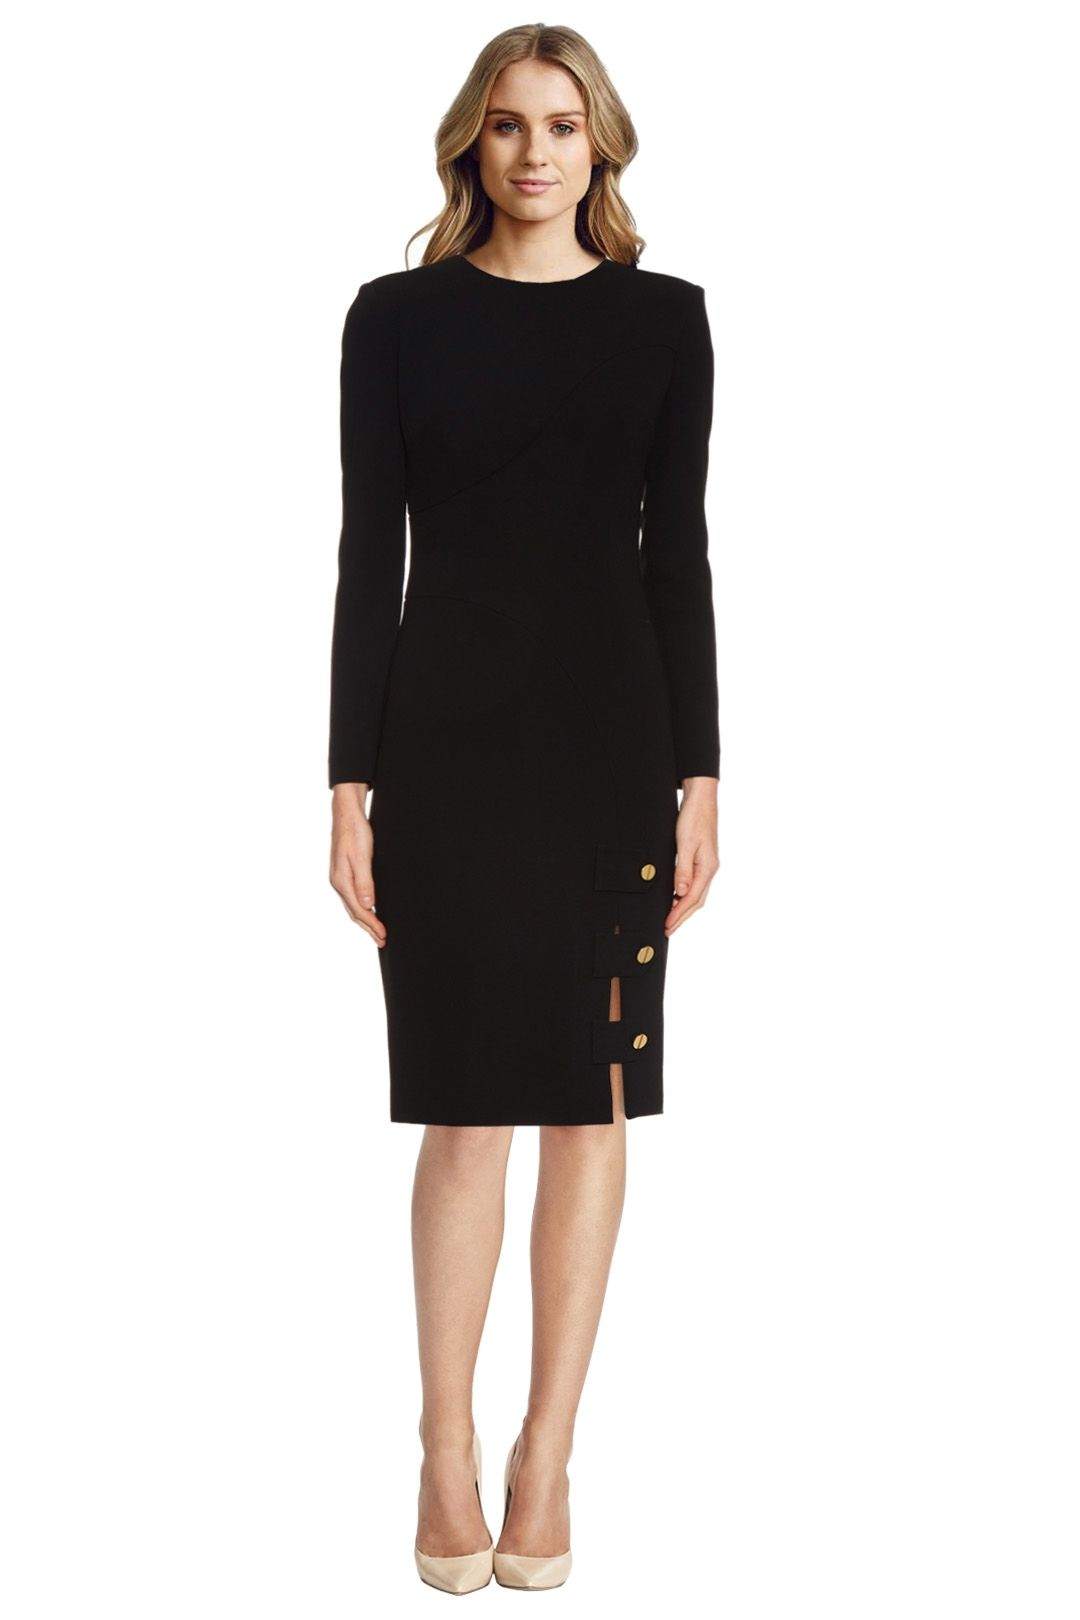 La Mania - Antares Long Sleeved Crepe Dress - Black - Front